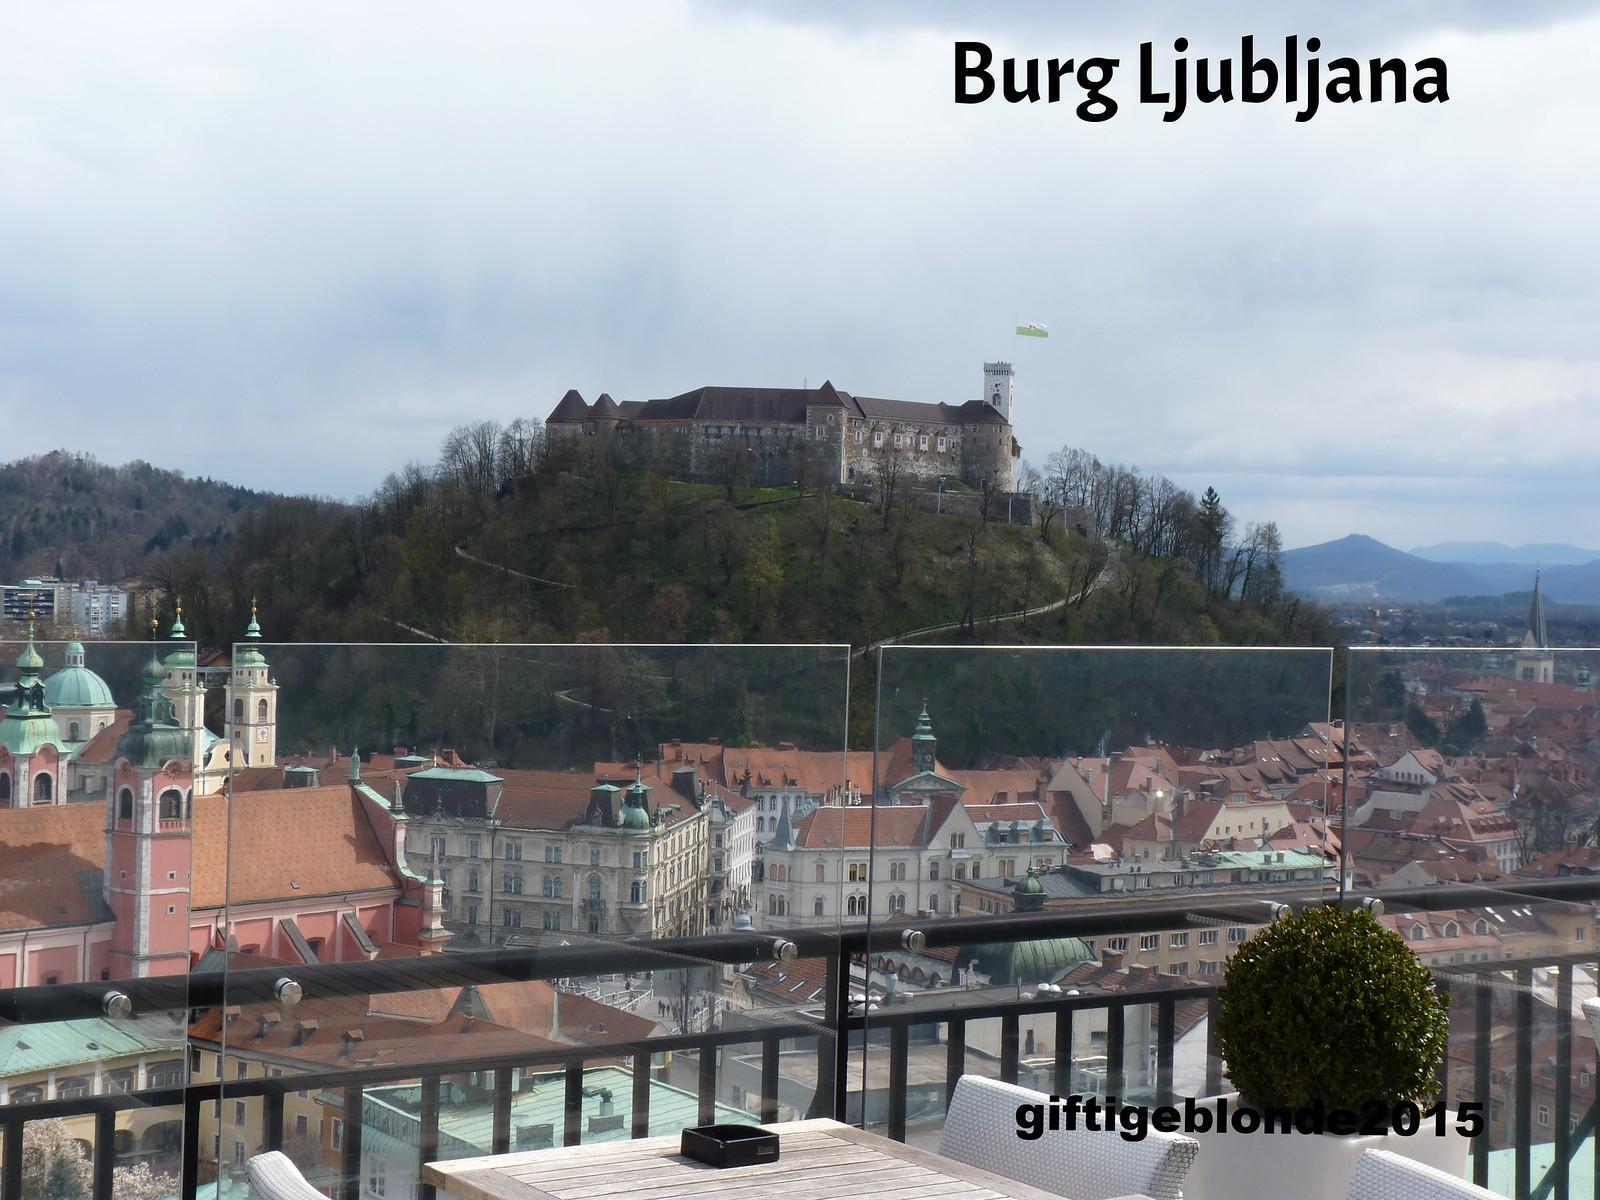 Slowenien, Ljubljana Burg